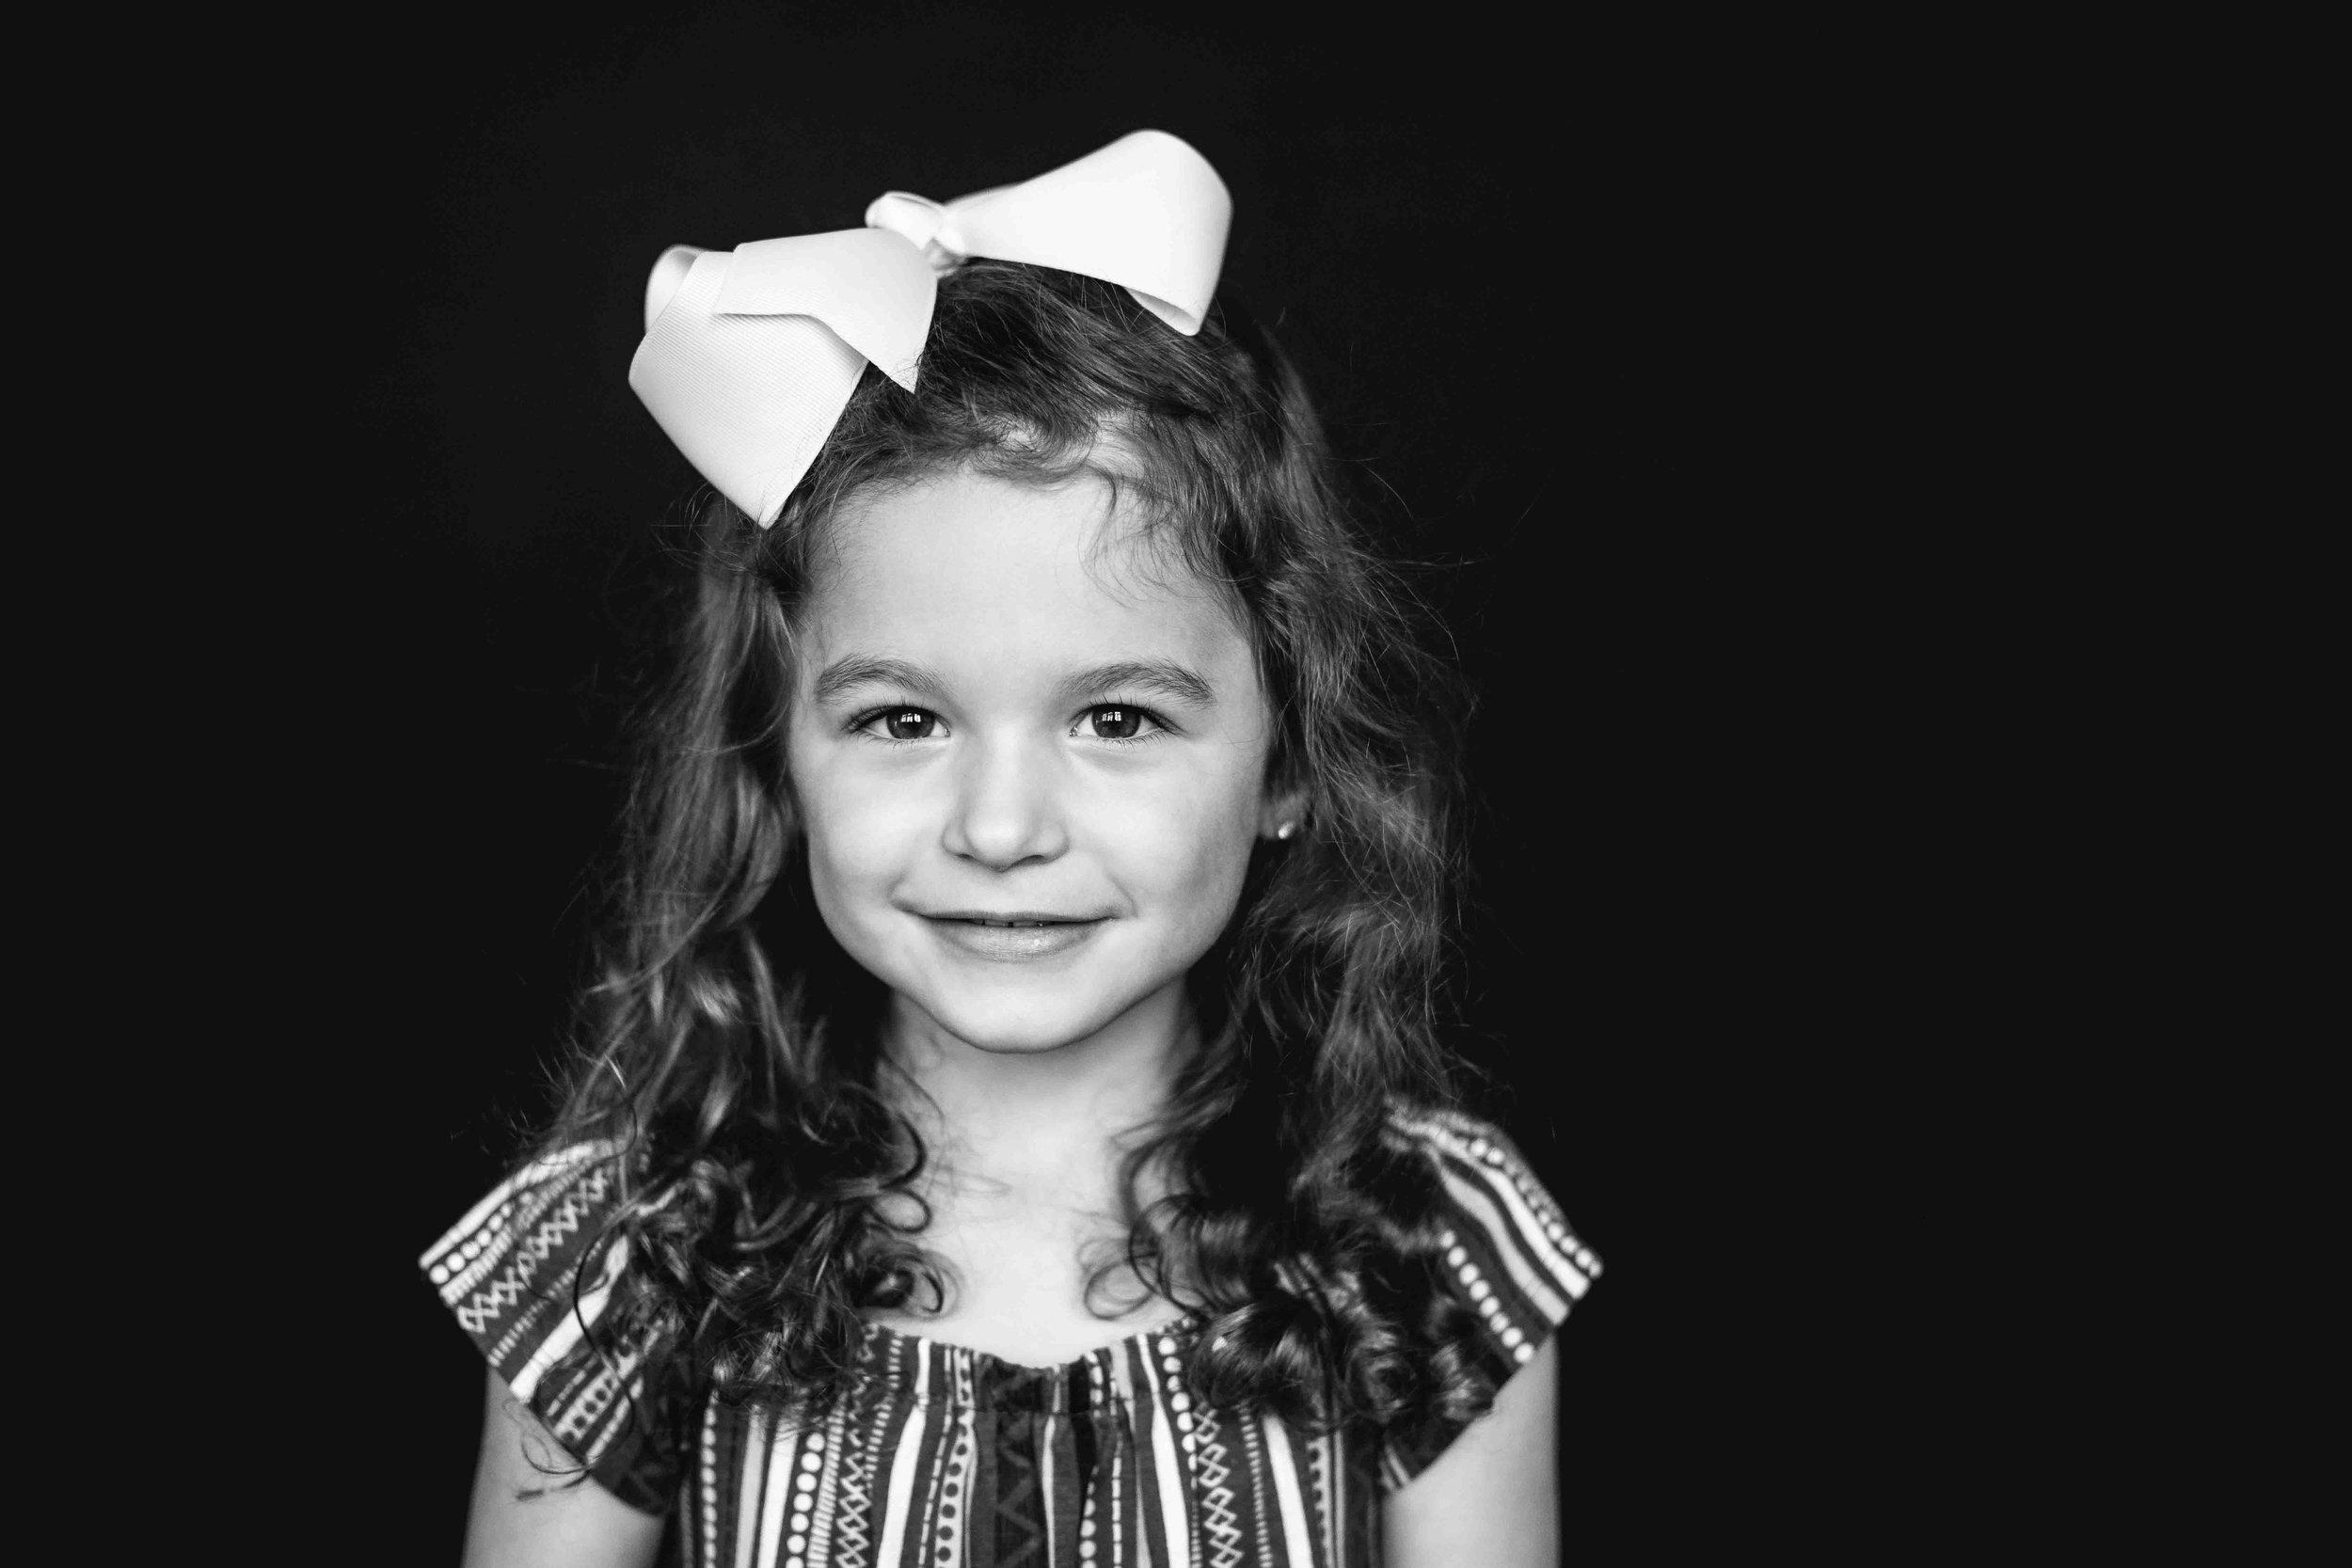 20180914_9886--3yr-prek__19--BLACK&WHITE-----20snowflake-pittsburgh-boutique-school-photography.jpg